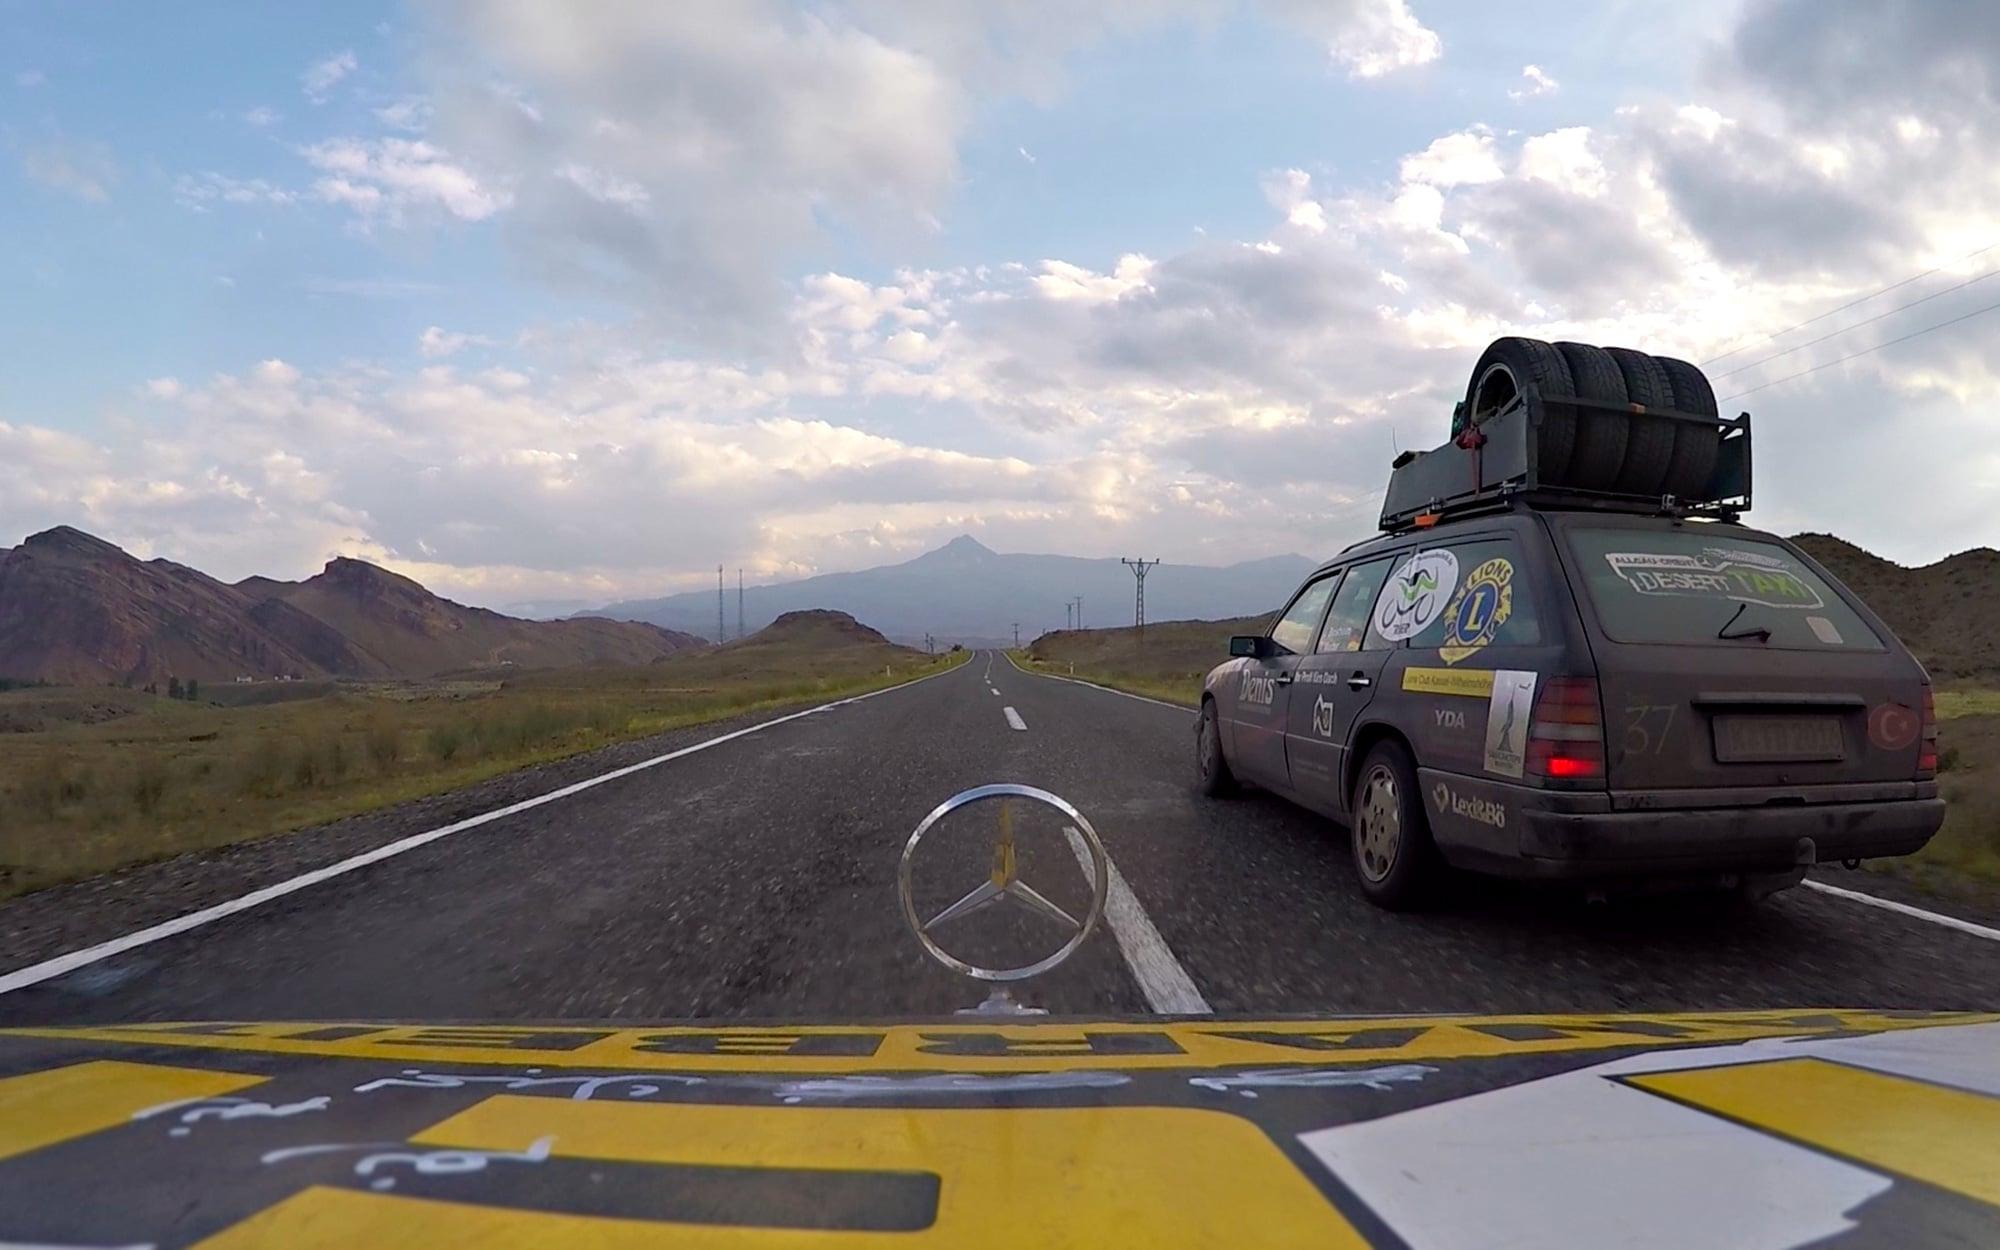 GALERIE21_team-desert-taxi-trier